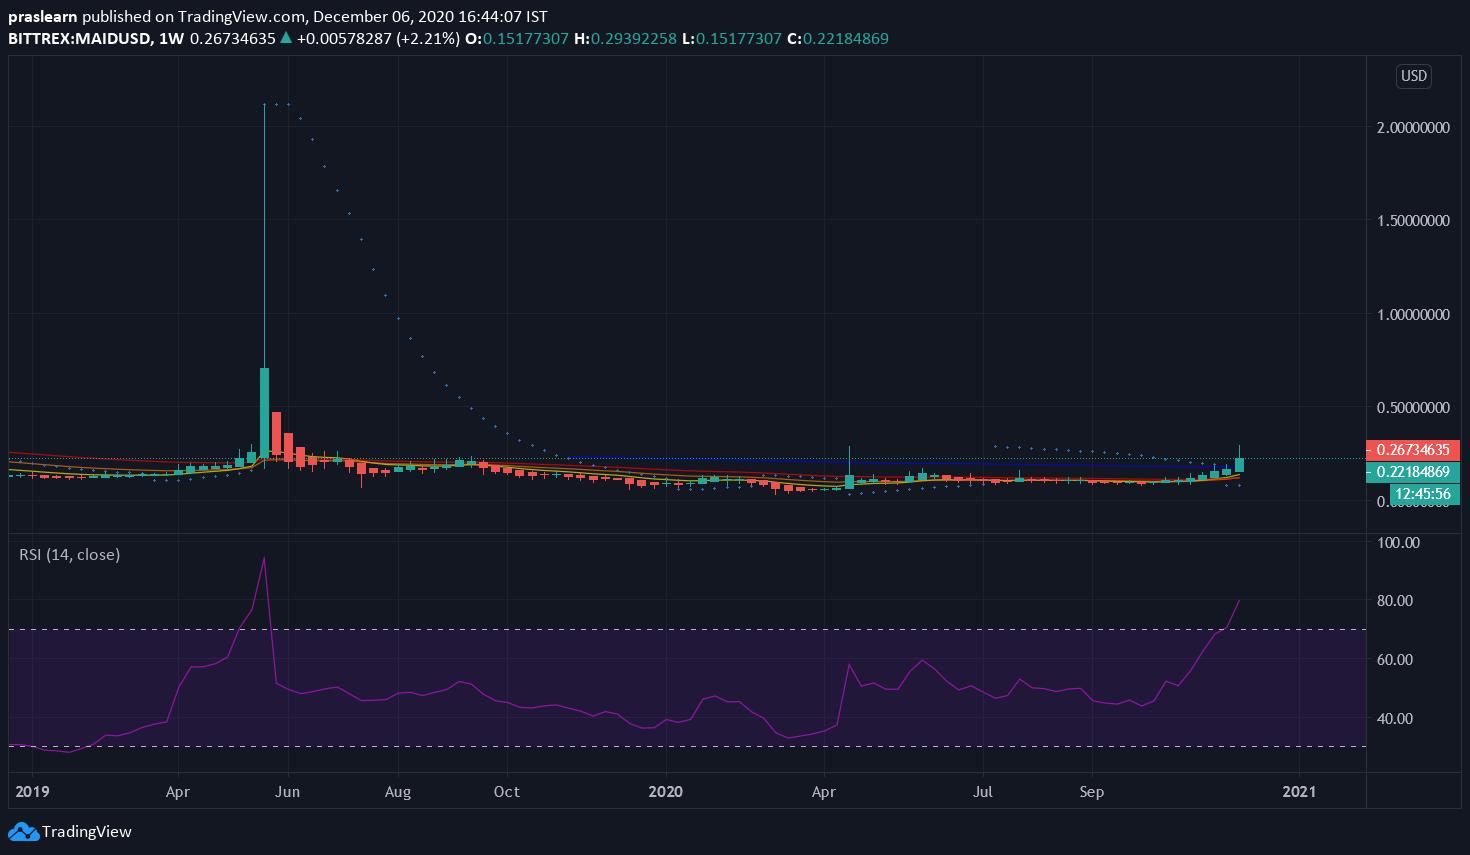 MAID/USD Weekly Chart: TradingView